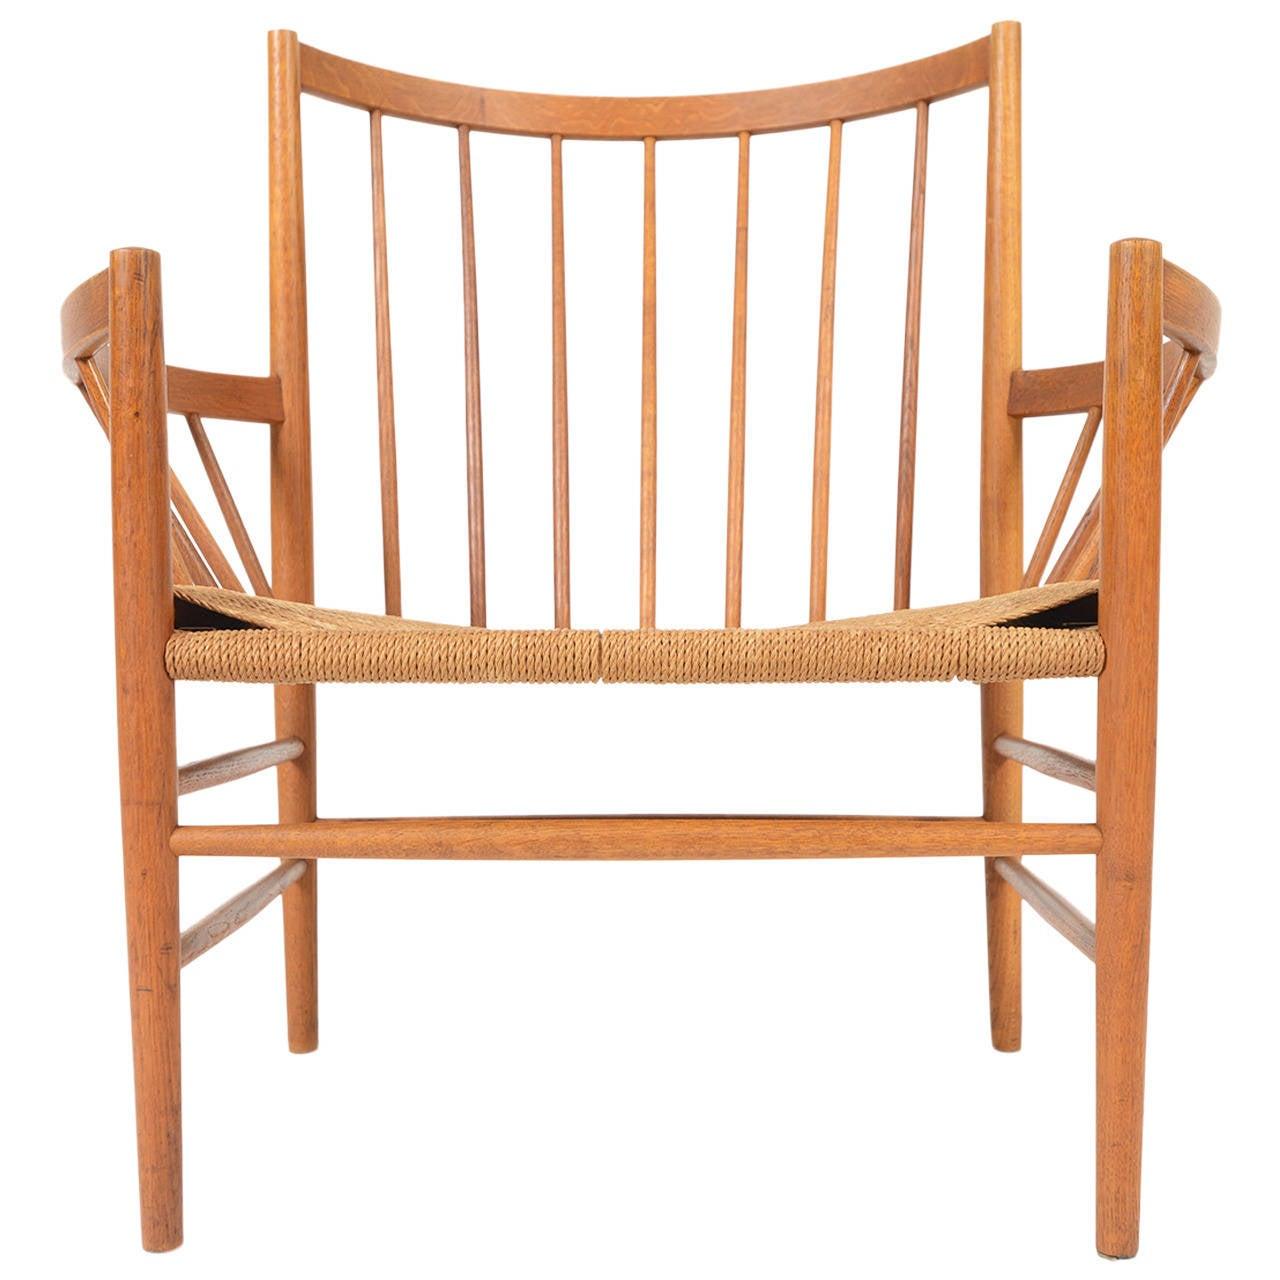 J rgen b kmark oak and paper cord lounge chair for fdm m bler for sale at 1stdibs - Paper furniture ...